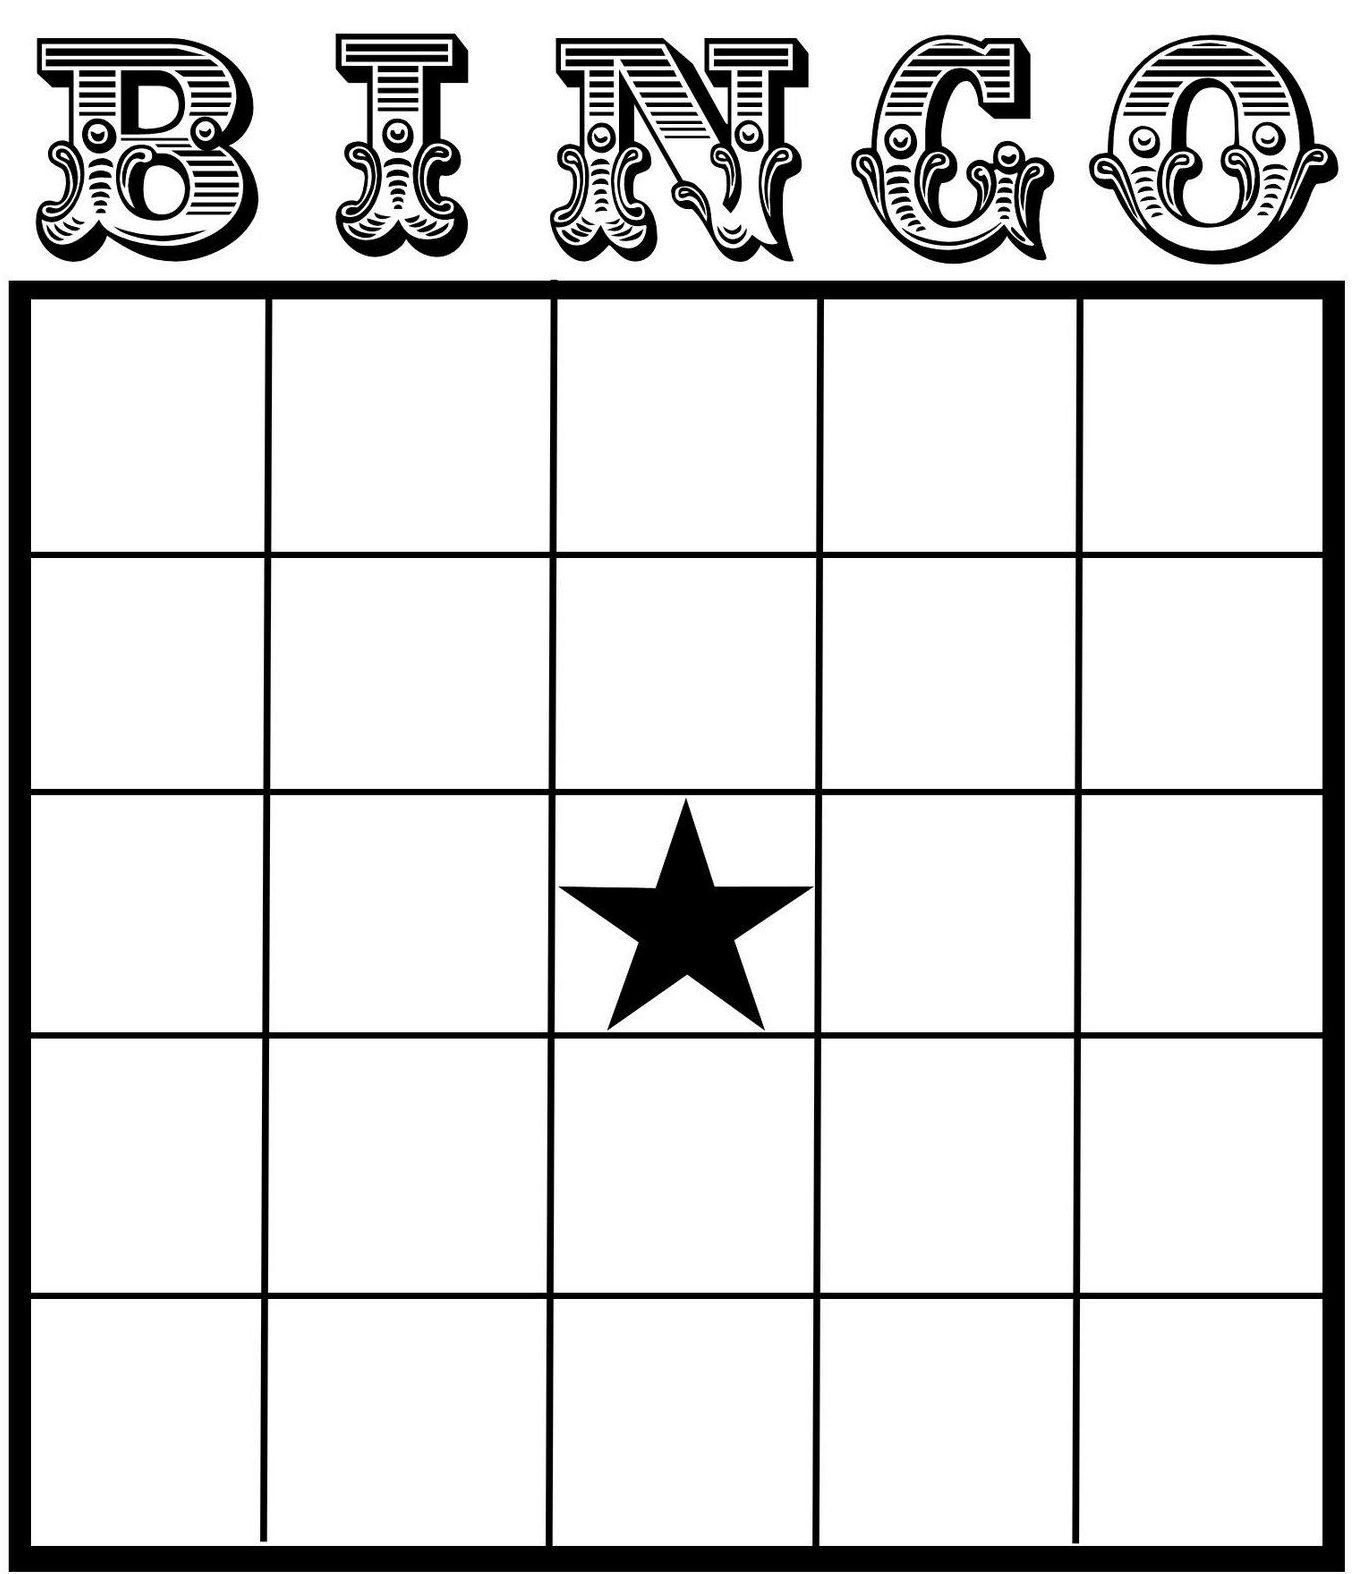 Free Bingo Card Template Free Printable Bingo Card Template Set Your Plan & Tasks